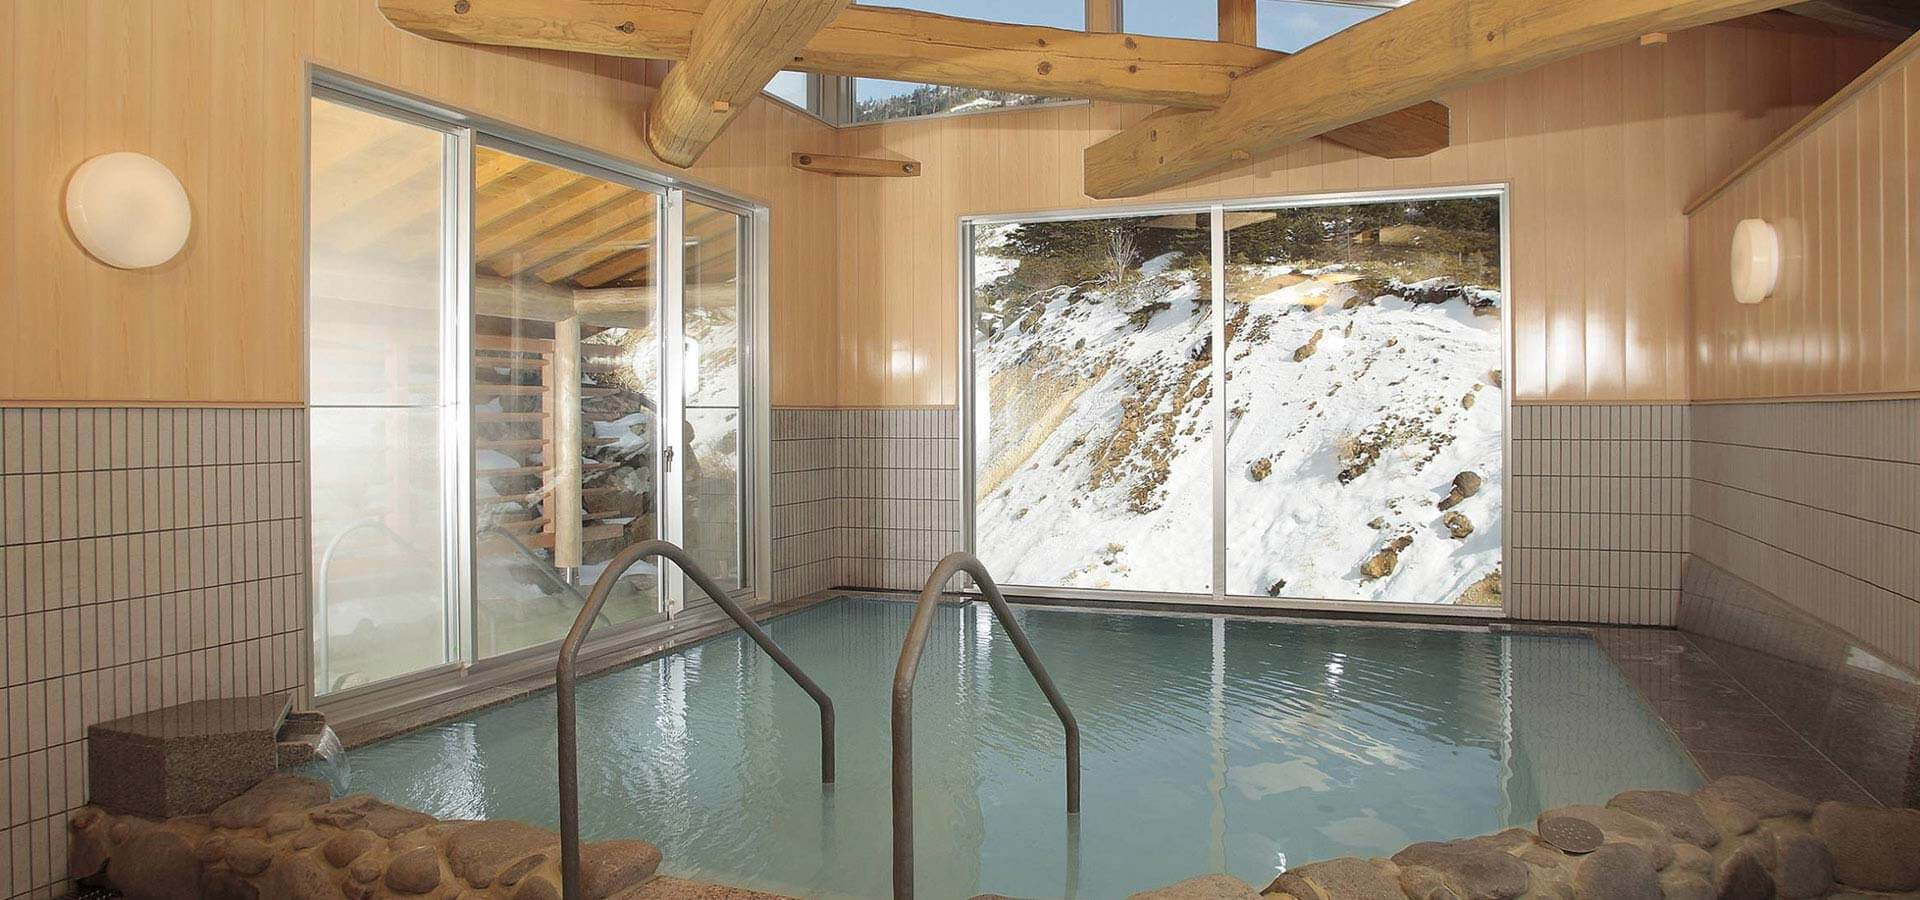 Hyakusen no yu 'uchiyu' (indoor hot spring)